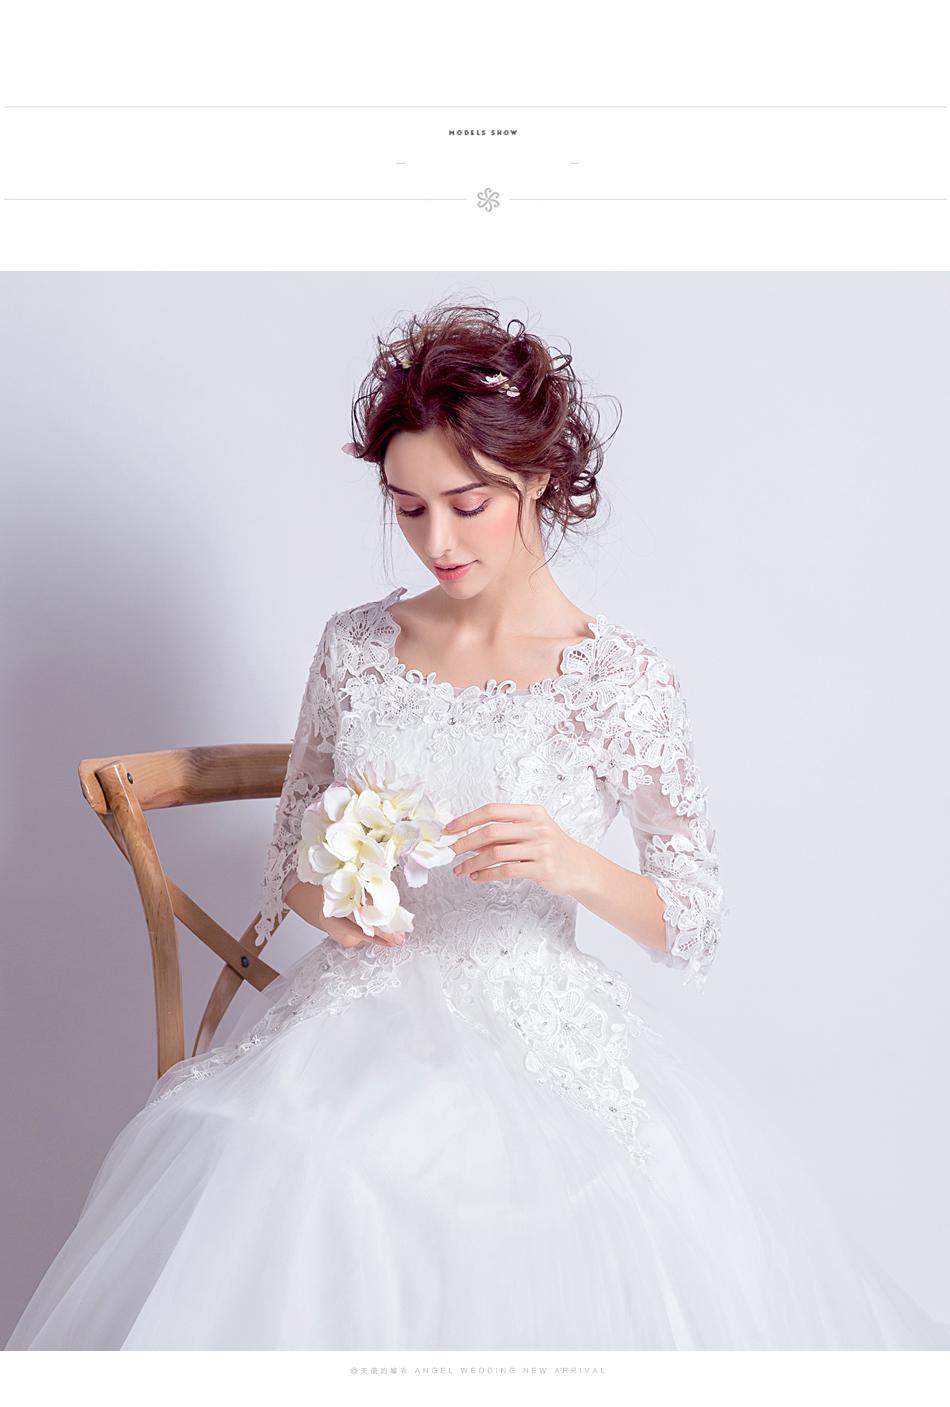 Angel Wedding Dress Marriage Bride Bridal Gown Vestido De Noiva 2017 Boat Neck horn sleeve, big tail 6910 9